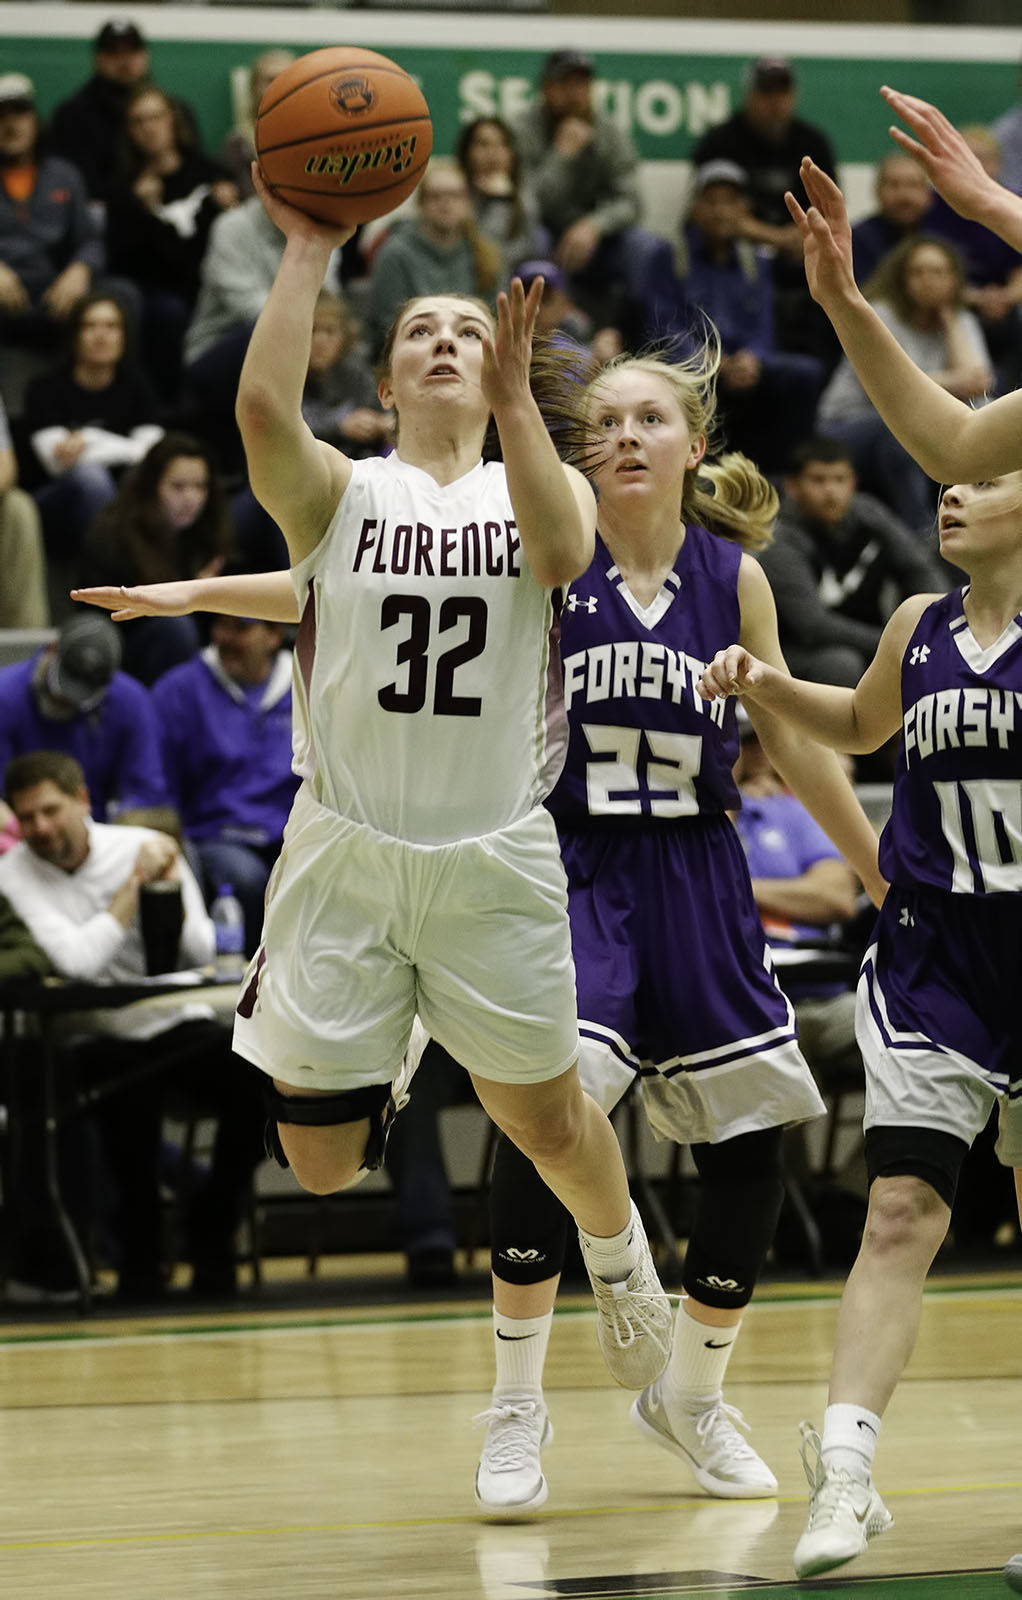 State B girls basketball: Florence-Carlton vs. Forsyth